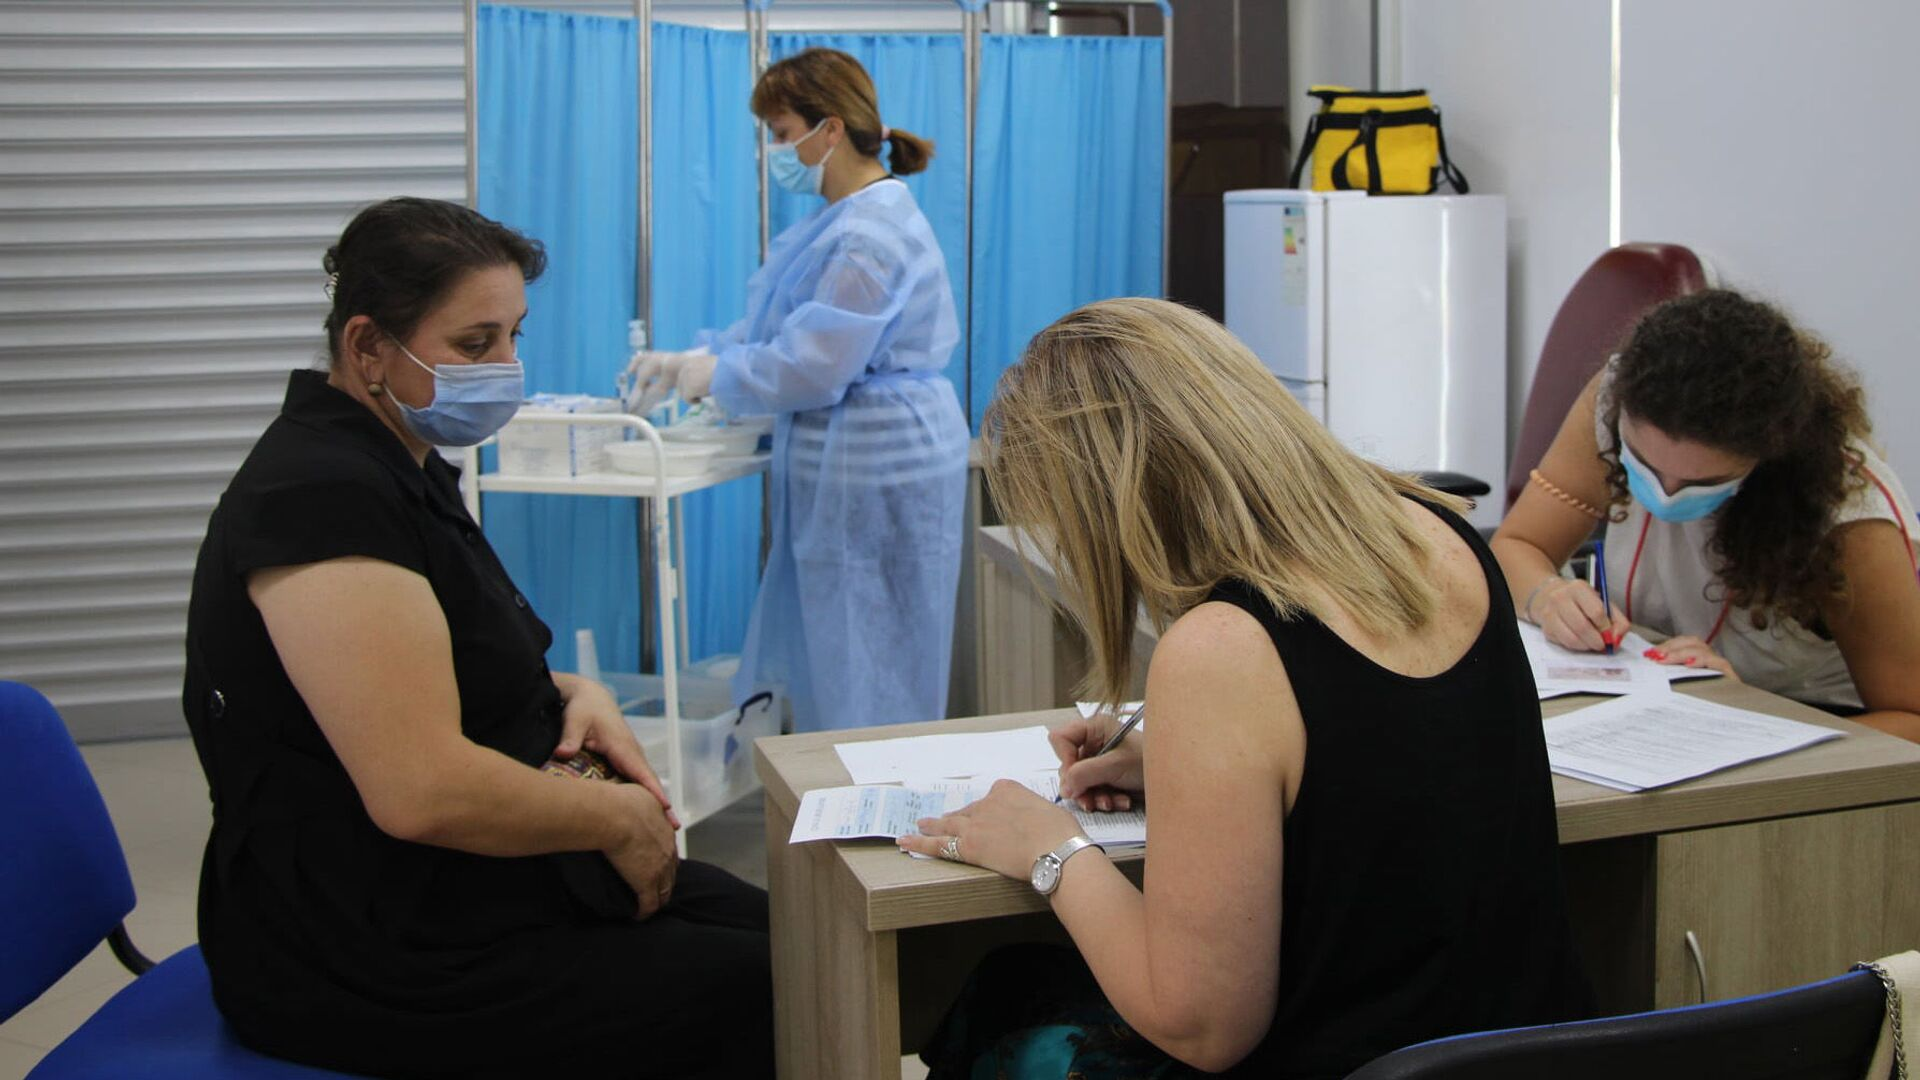 Эпидемия коронавируса - вакцинация населения в Аджарии - Sputnik Грузия, 1920, 20.09.2021